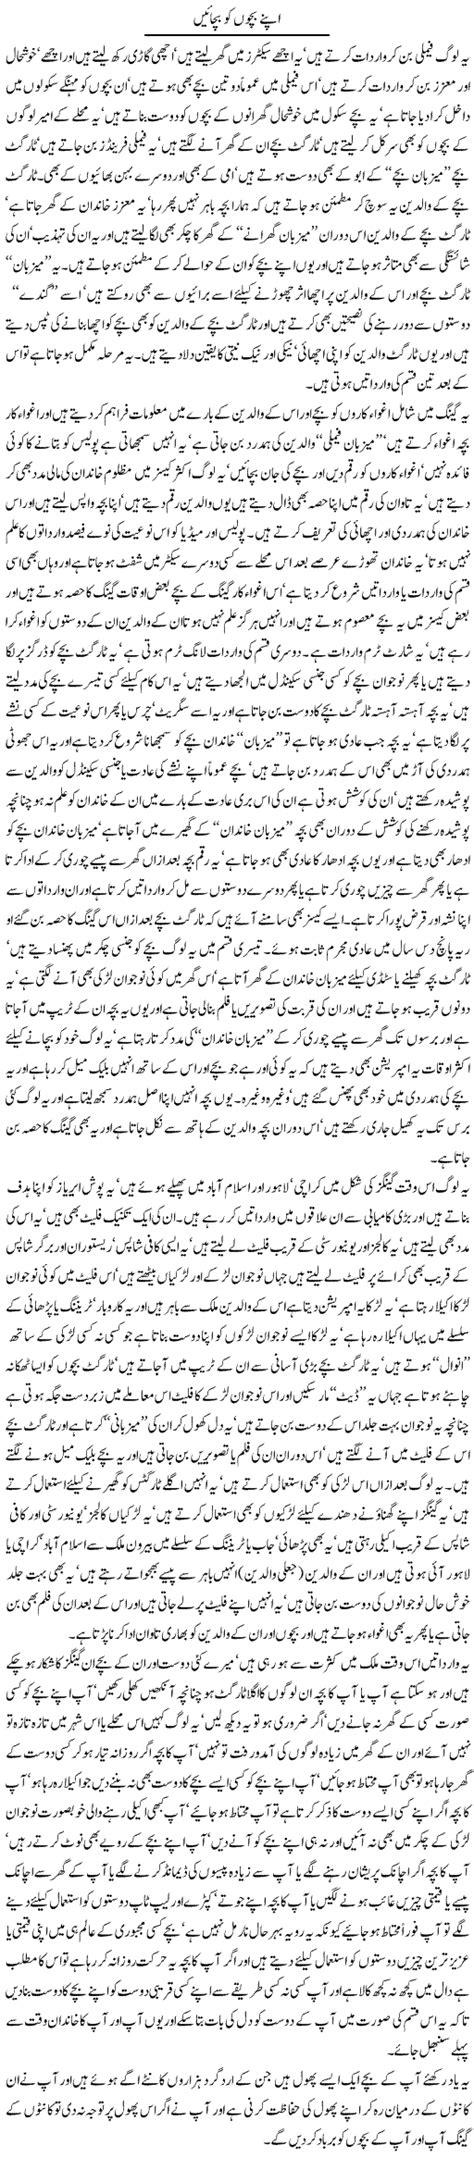 Javed Chaudhry Columns  Apnay Bachon Ko Bachayn  Javed Chaudhry